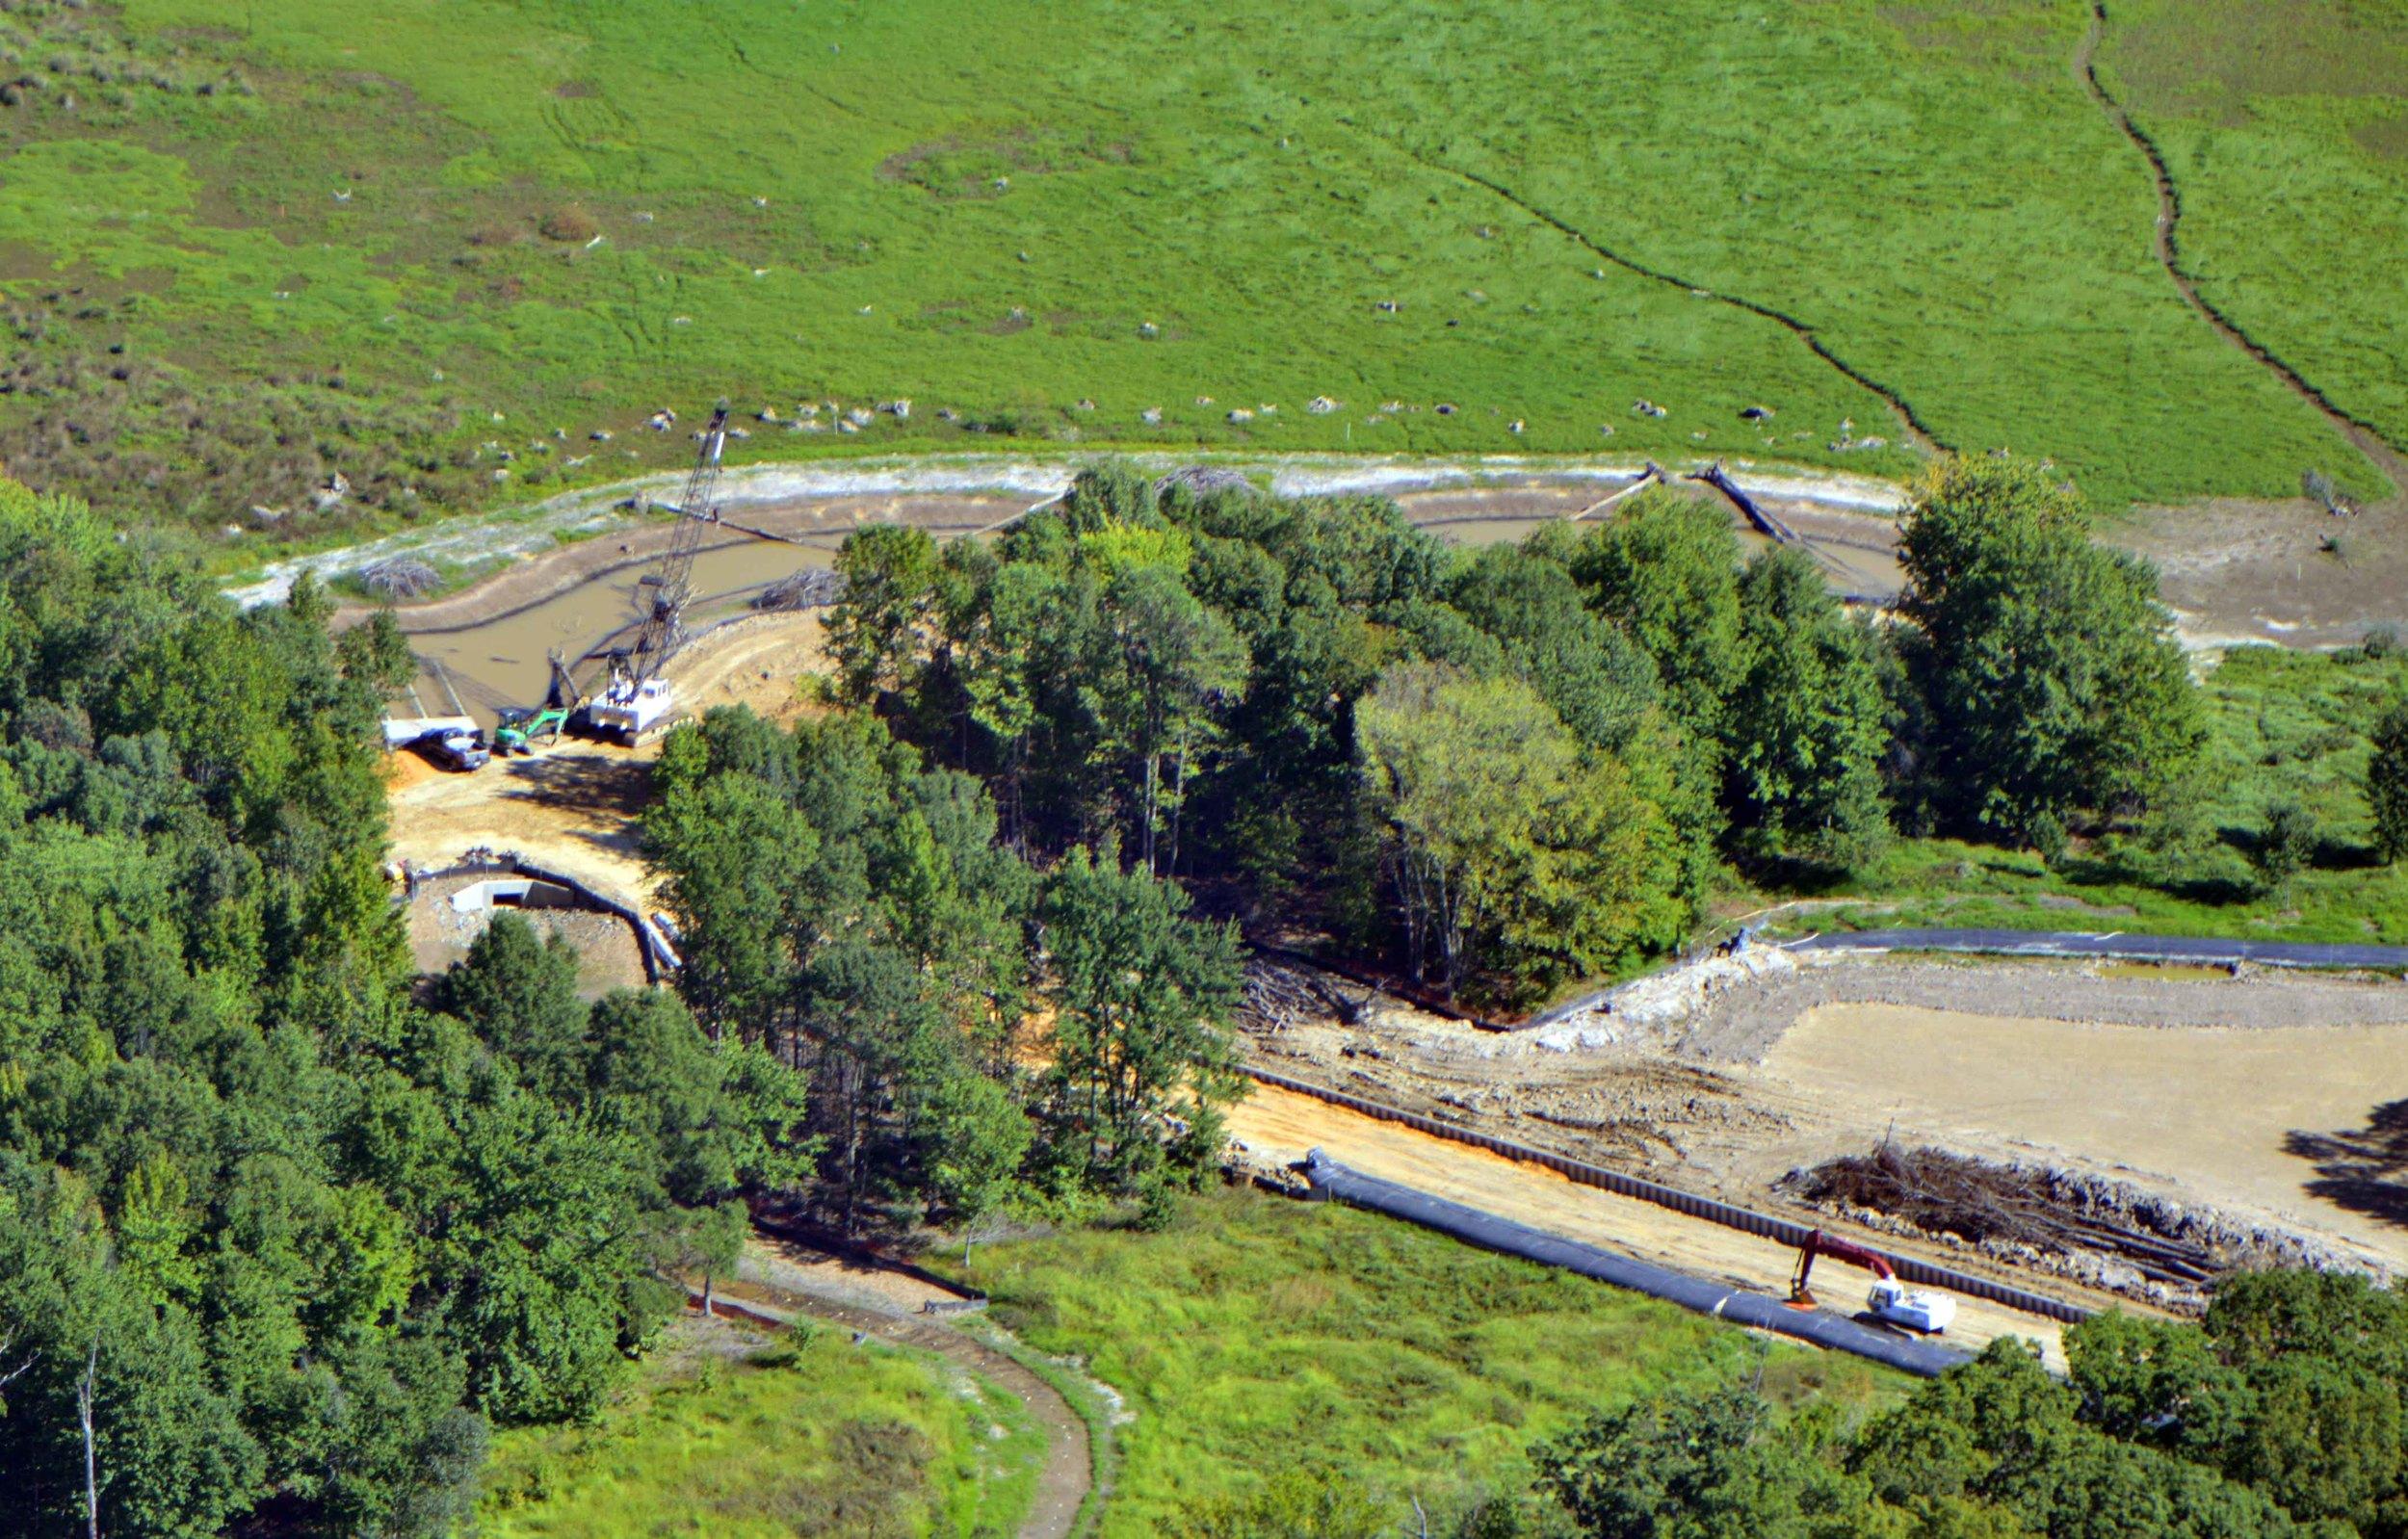 Construction of Huntley Meadows Park wetland restoration